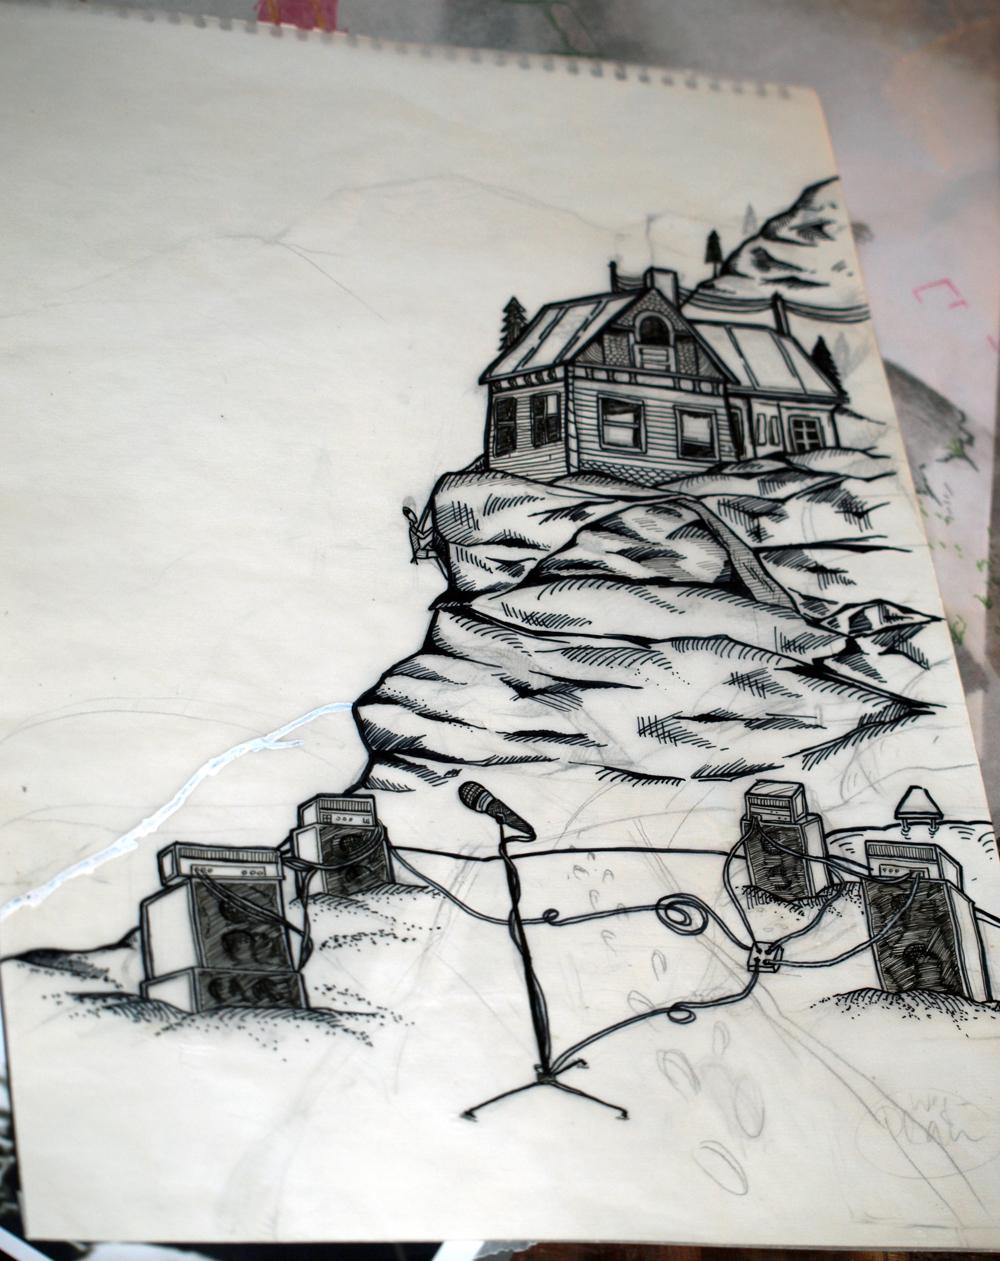 3/23 Silk scrren print: Rock on the Rocks Festival - image 7 - student project